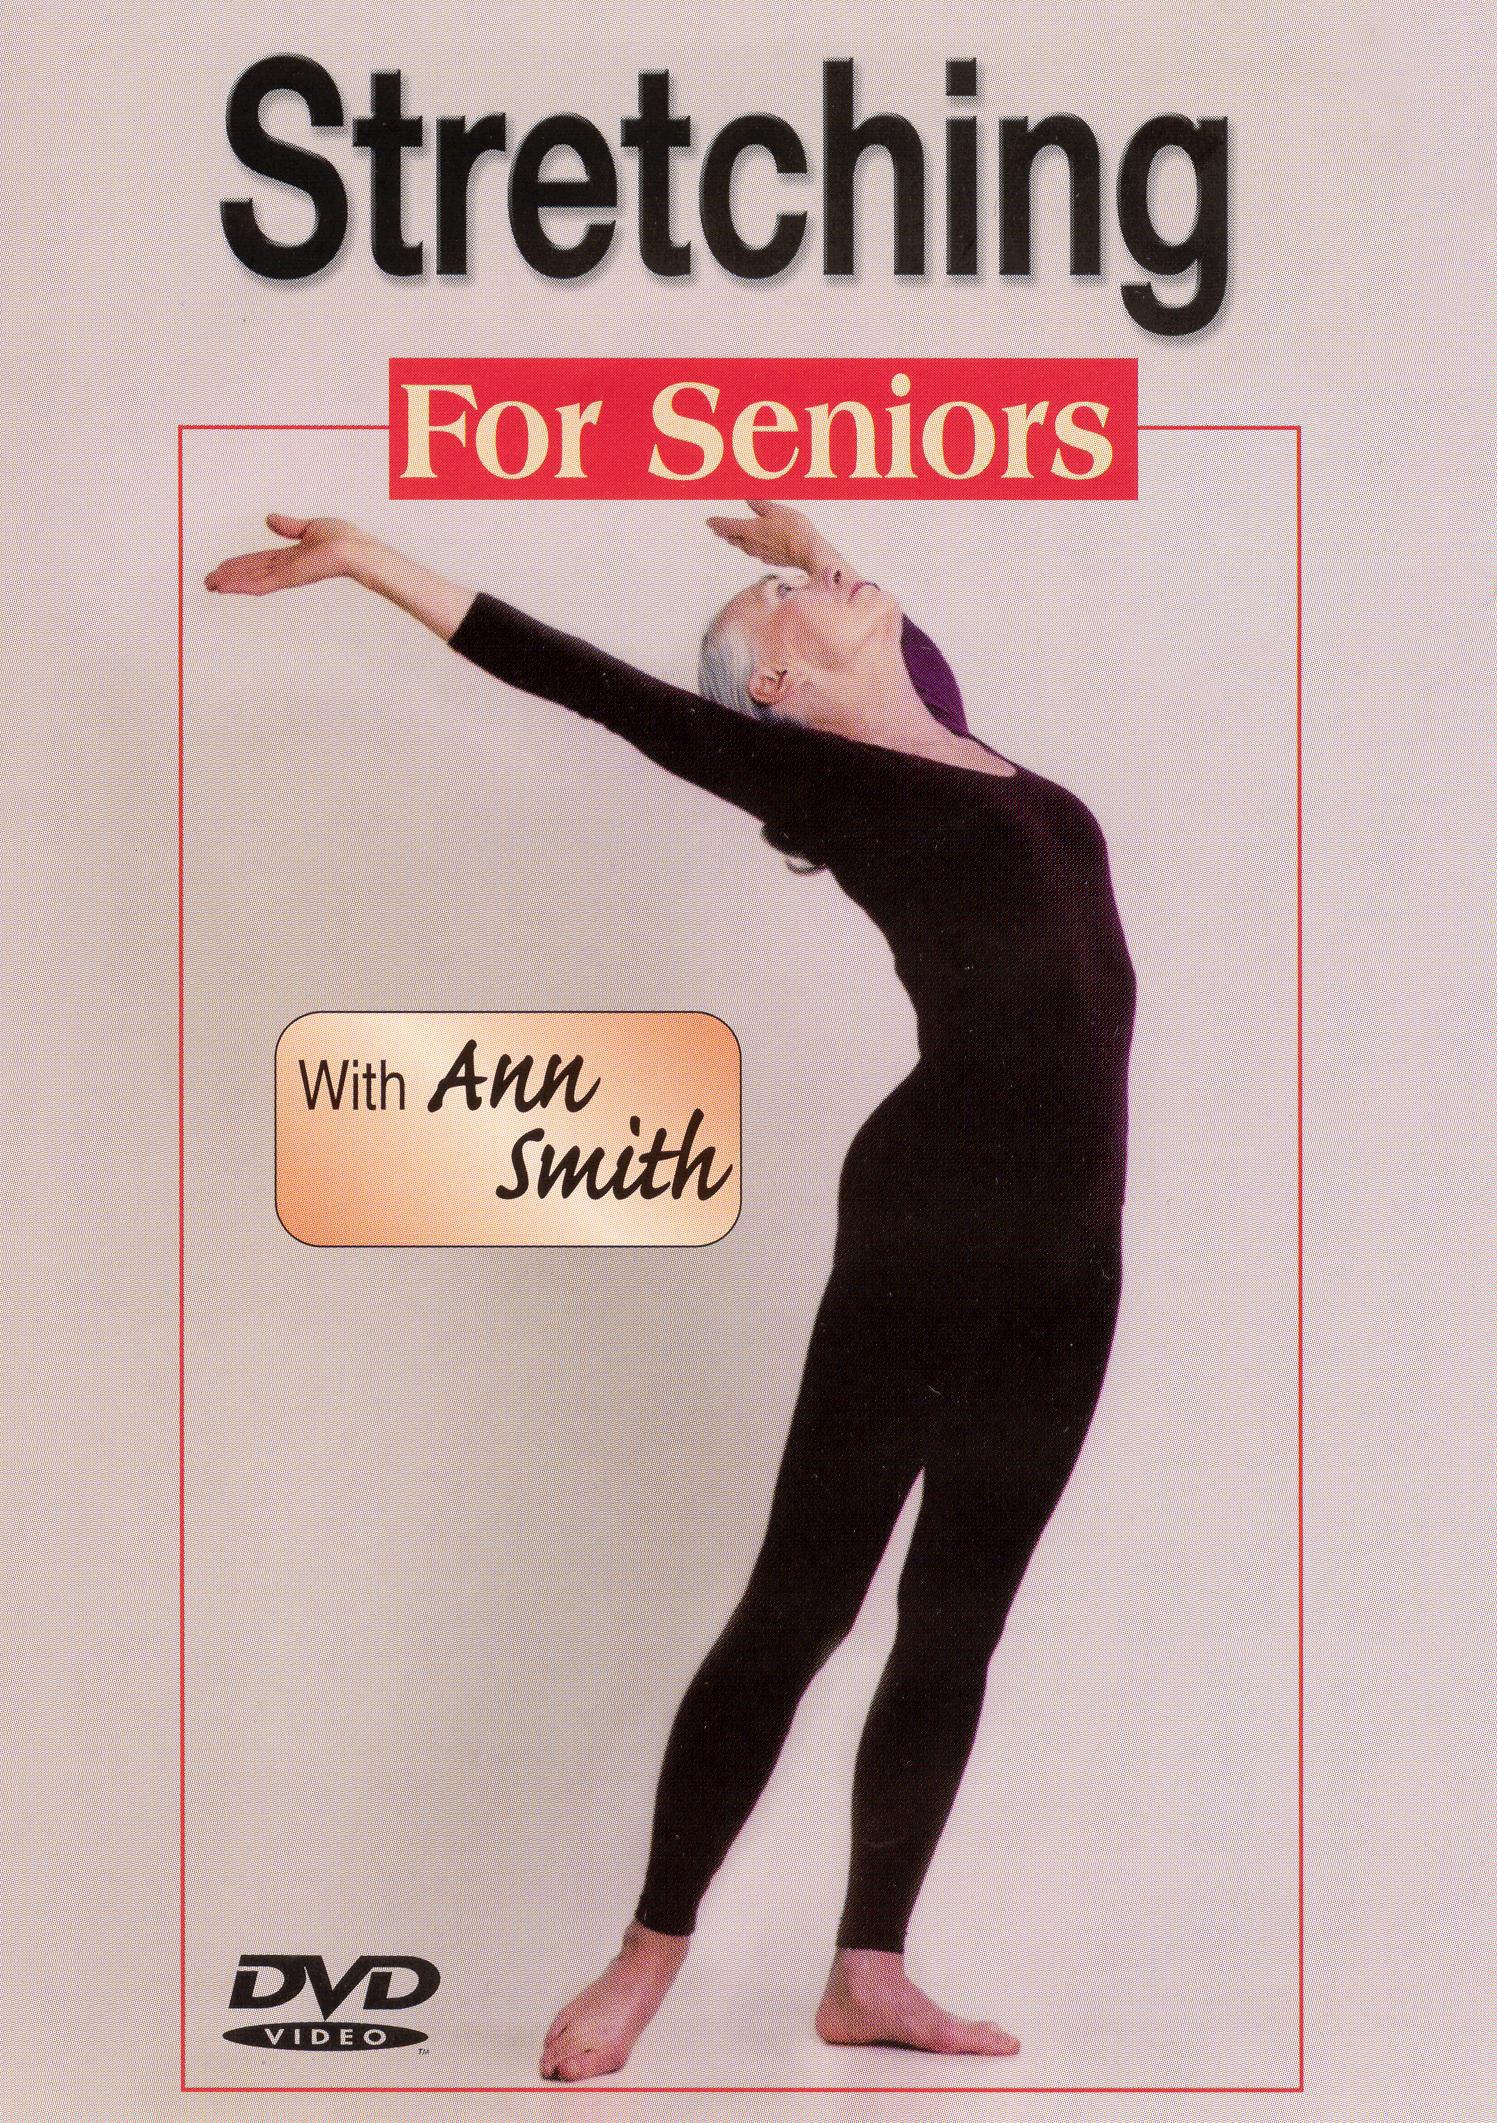 Ann Smith: Stretching for Seniors